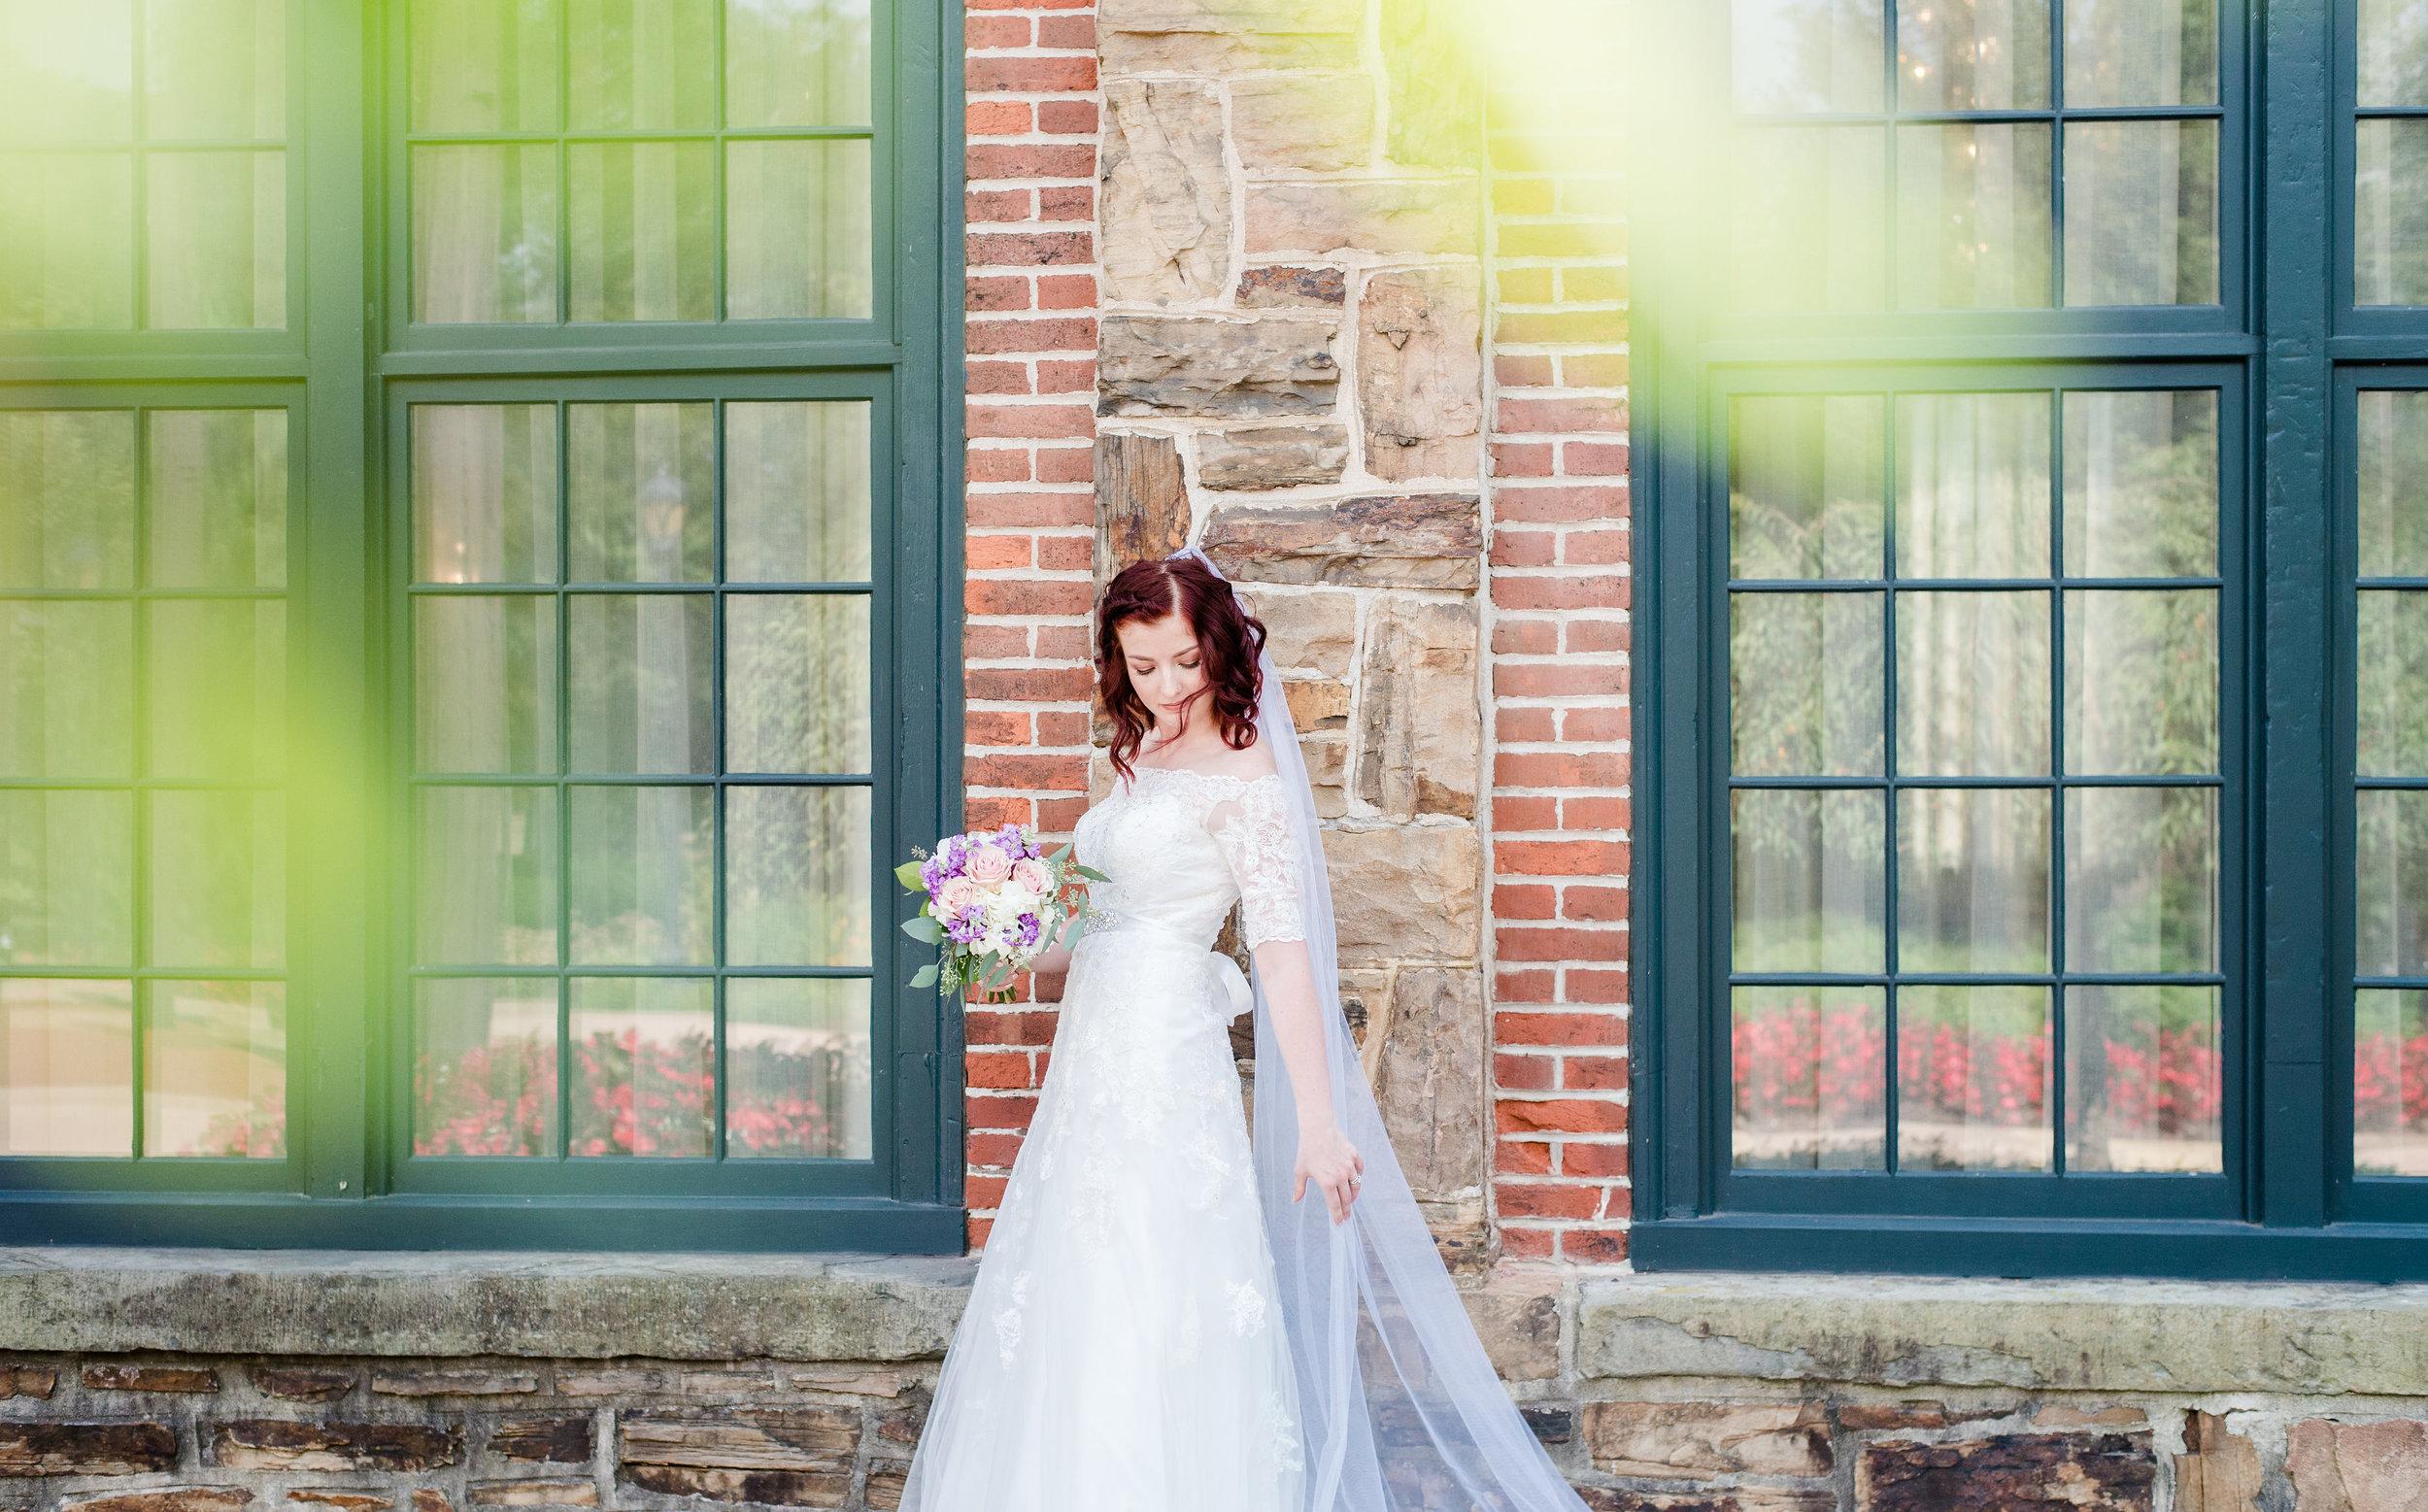 Wedding-Photographer-The-Foundry-Pheonixville-Pennsylvania-Andrea-Krout-Photography-169.jpg